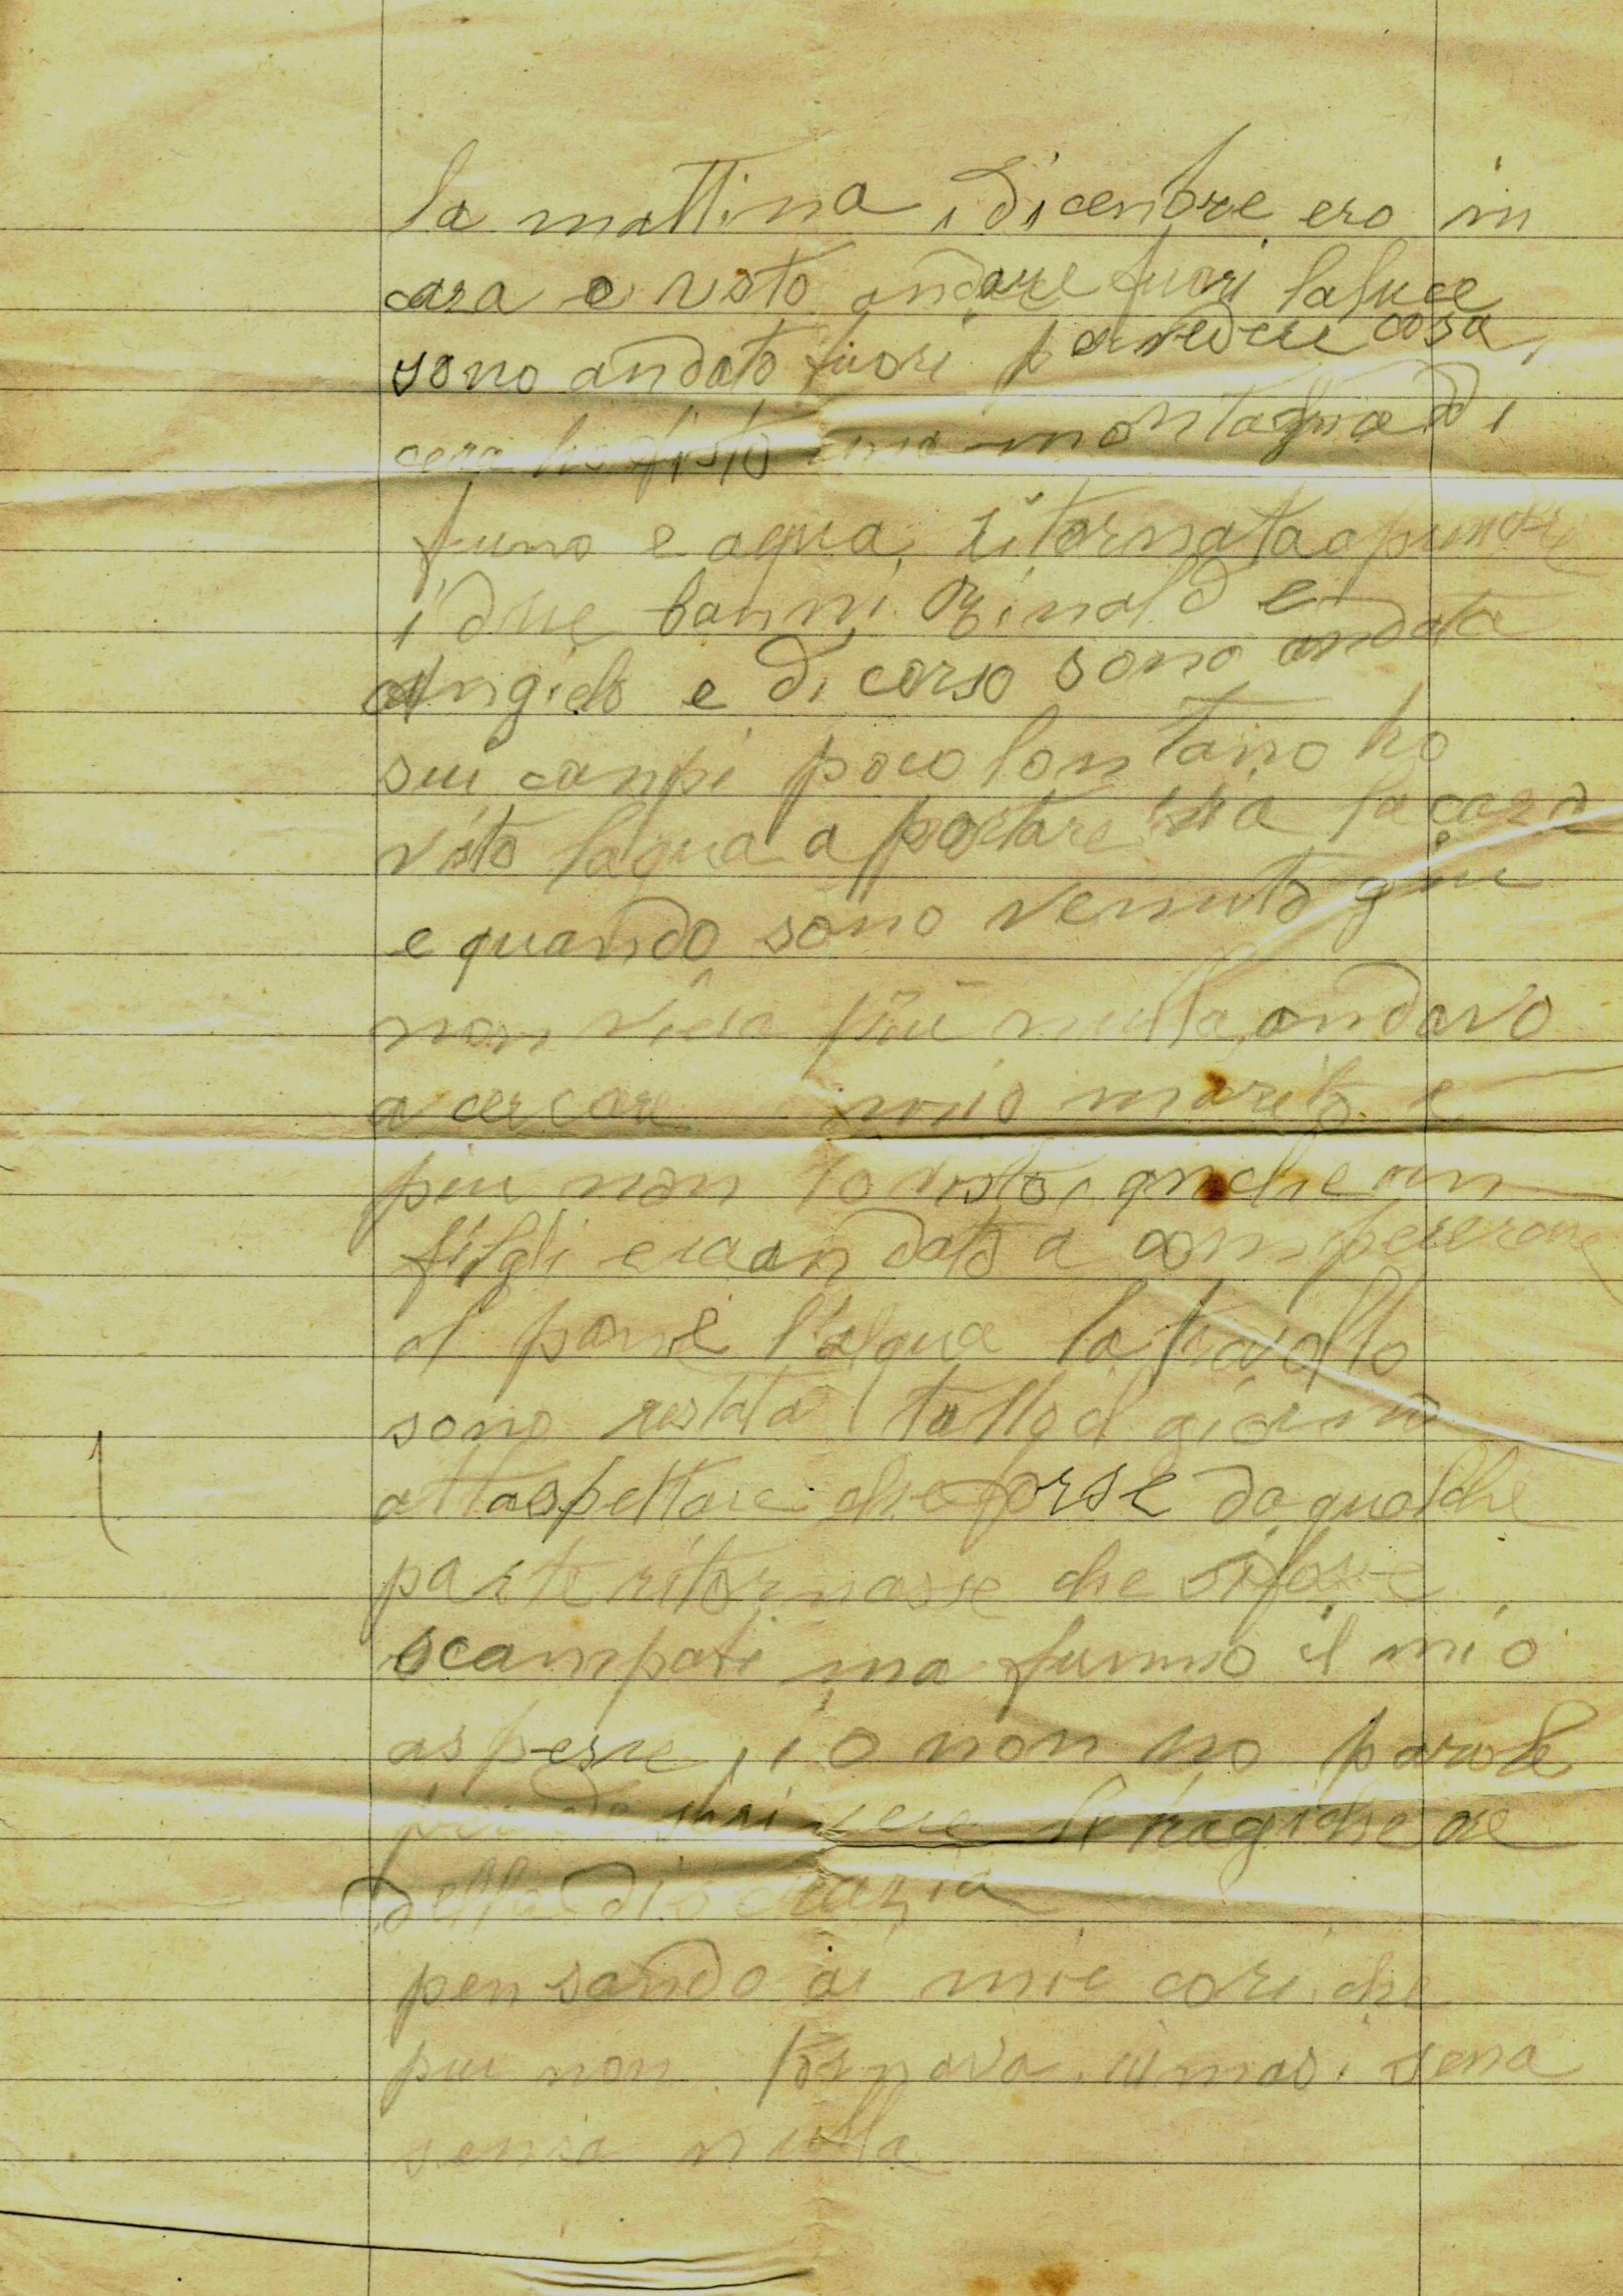 Lettera di Bettineschi Ortensia